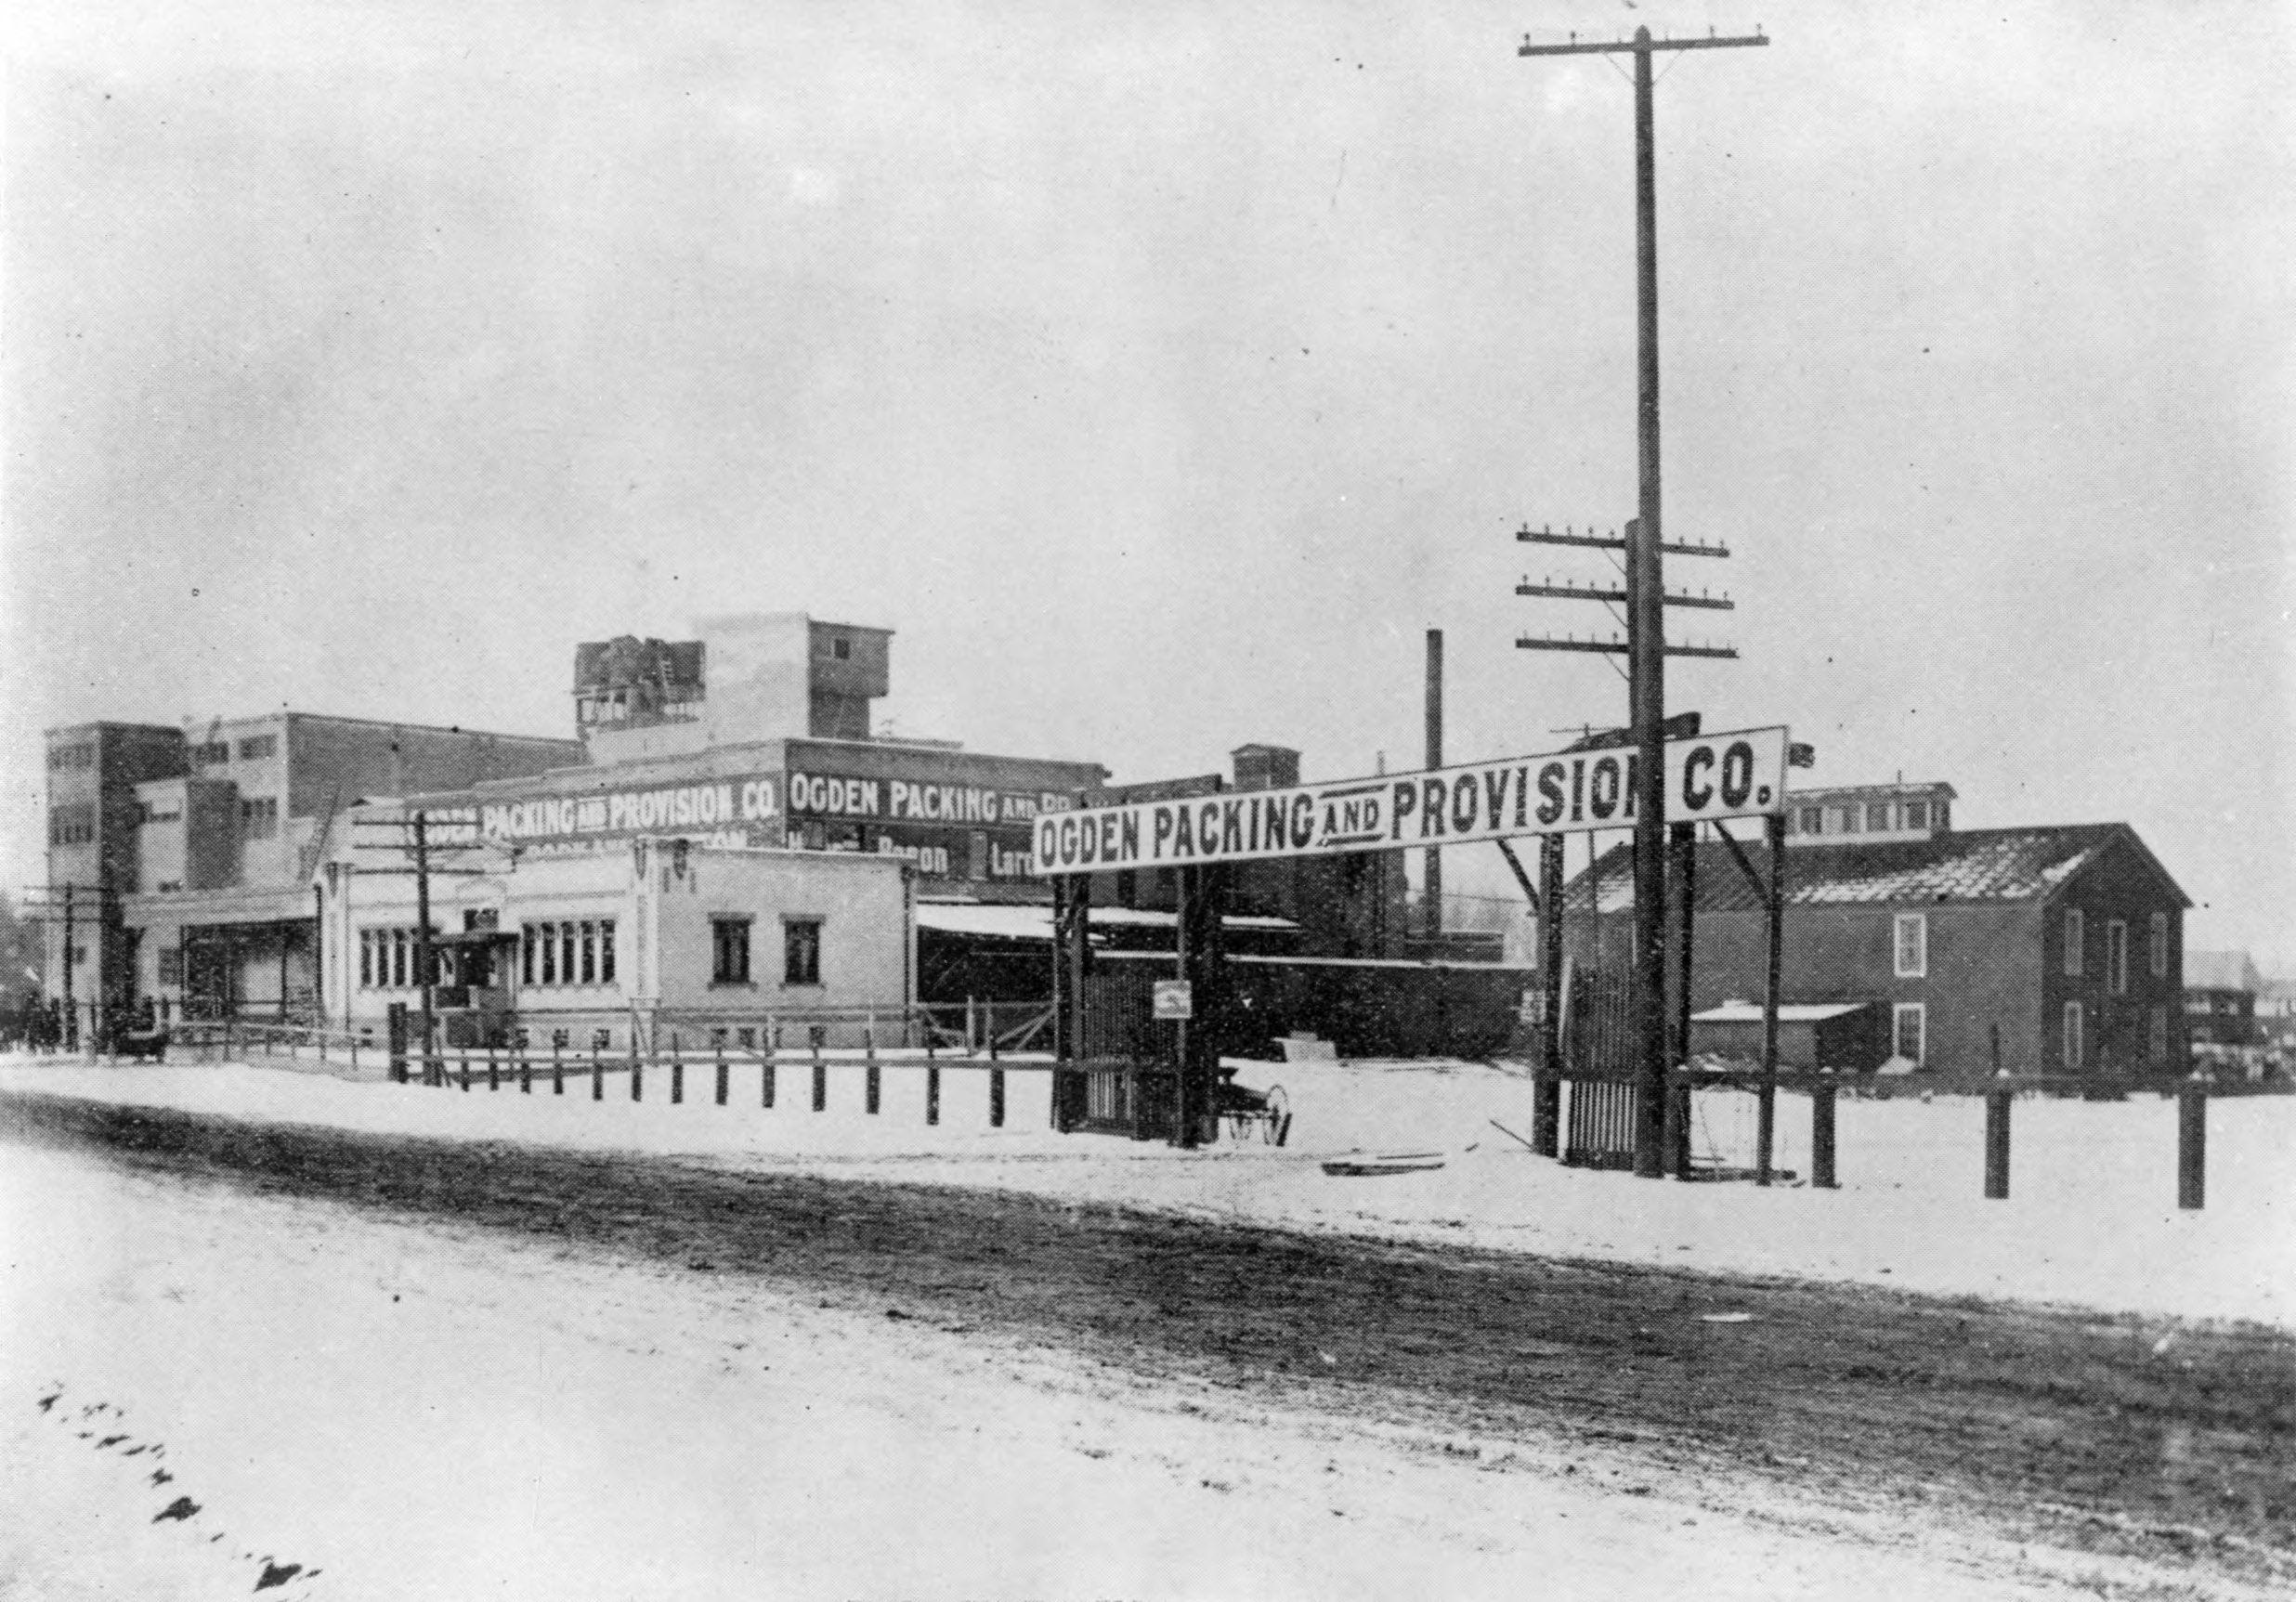 Ogden Packing And Provision Company Ca 1915 Ogden Utah